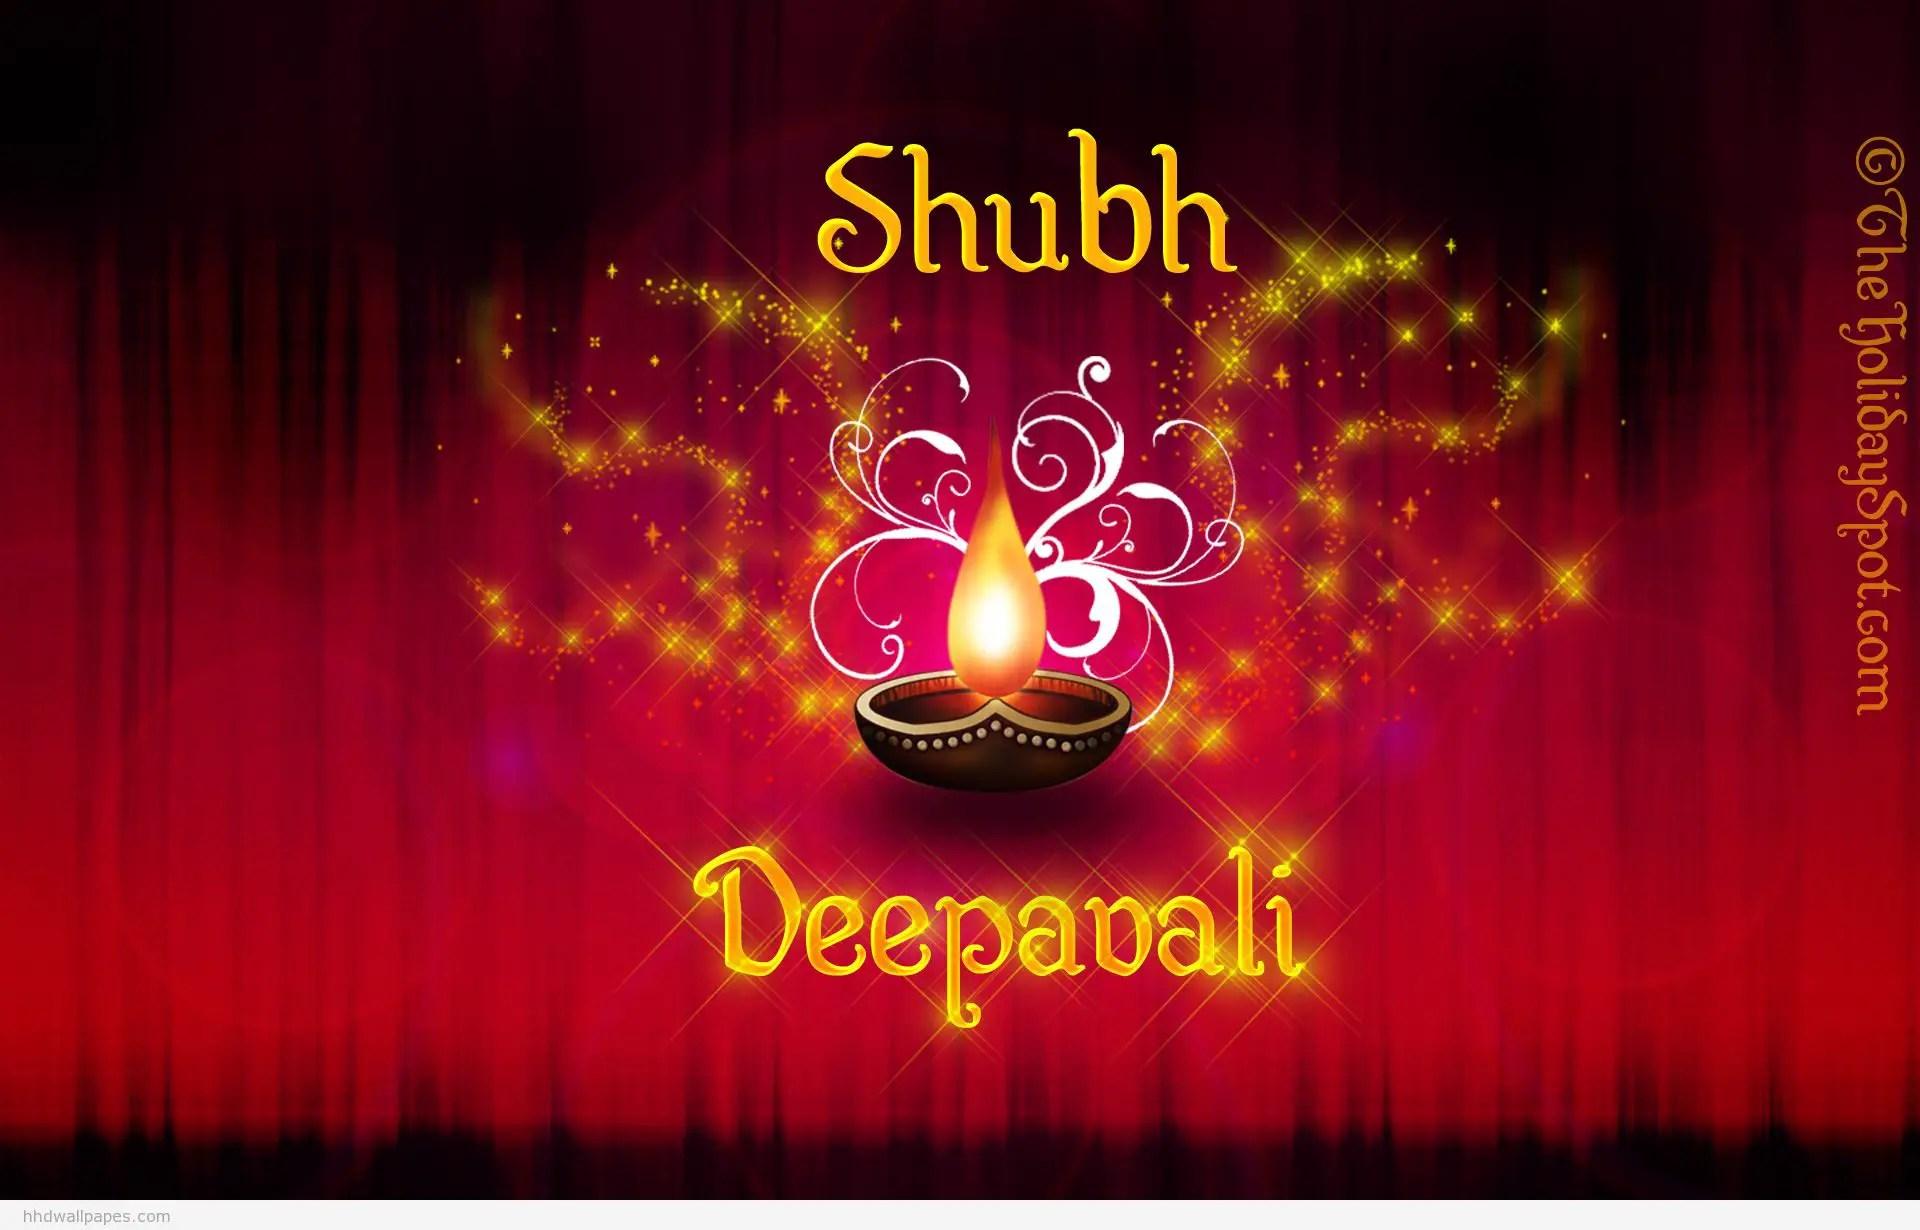 Diya Wallpaper Hd Happy Diwali Hd Wallpapers Movie Hd Wallpapers